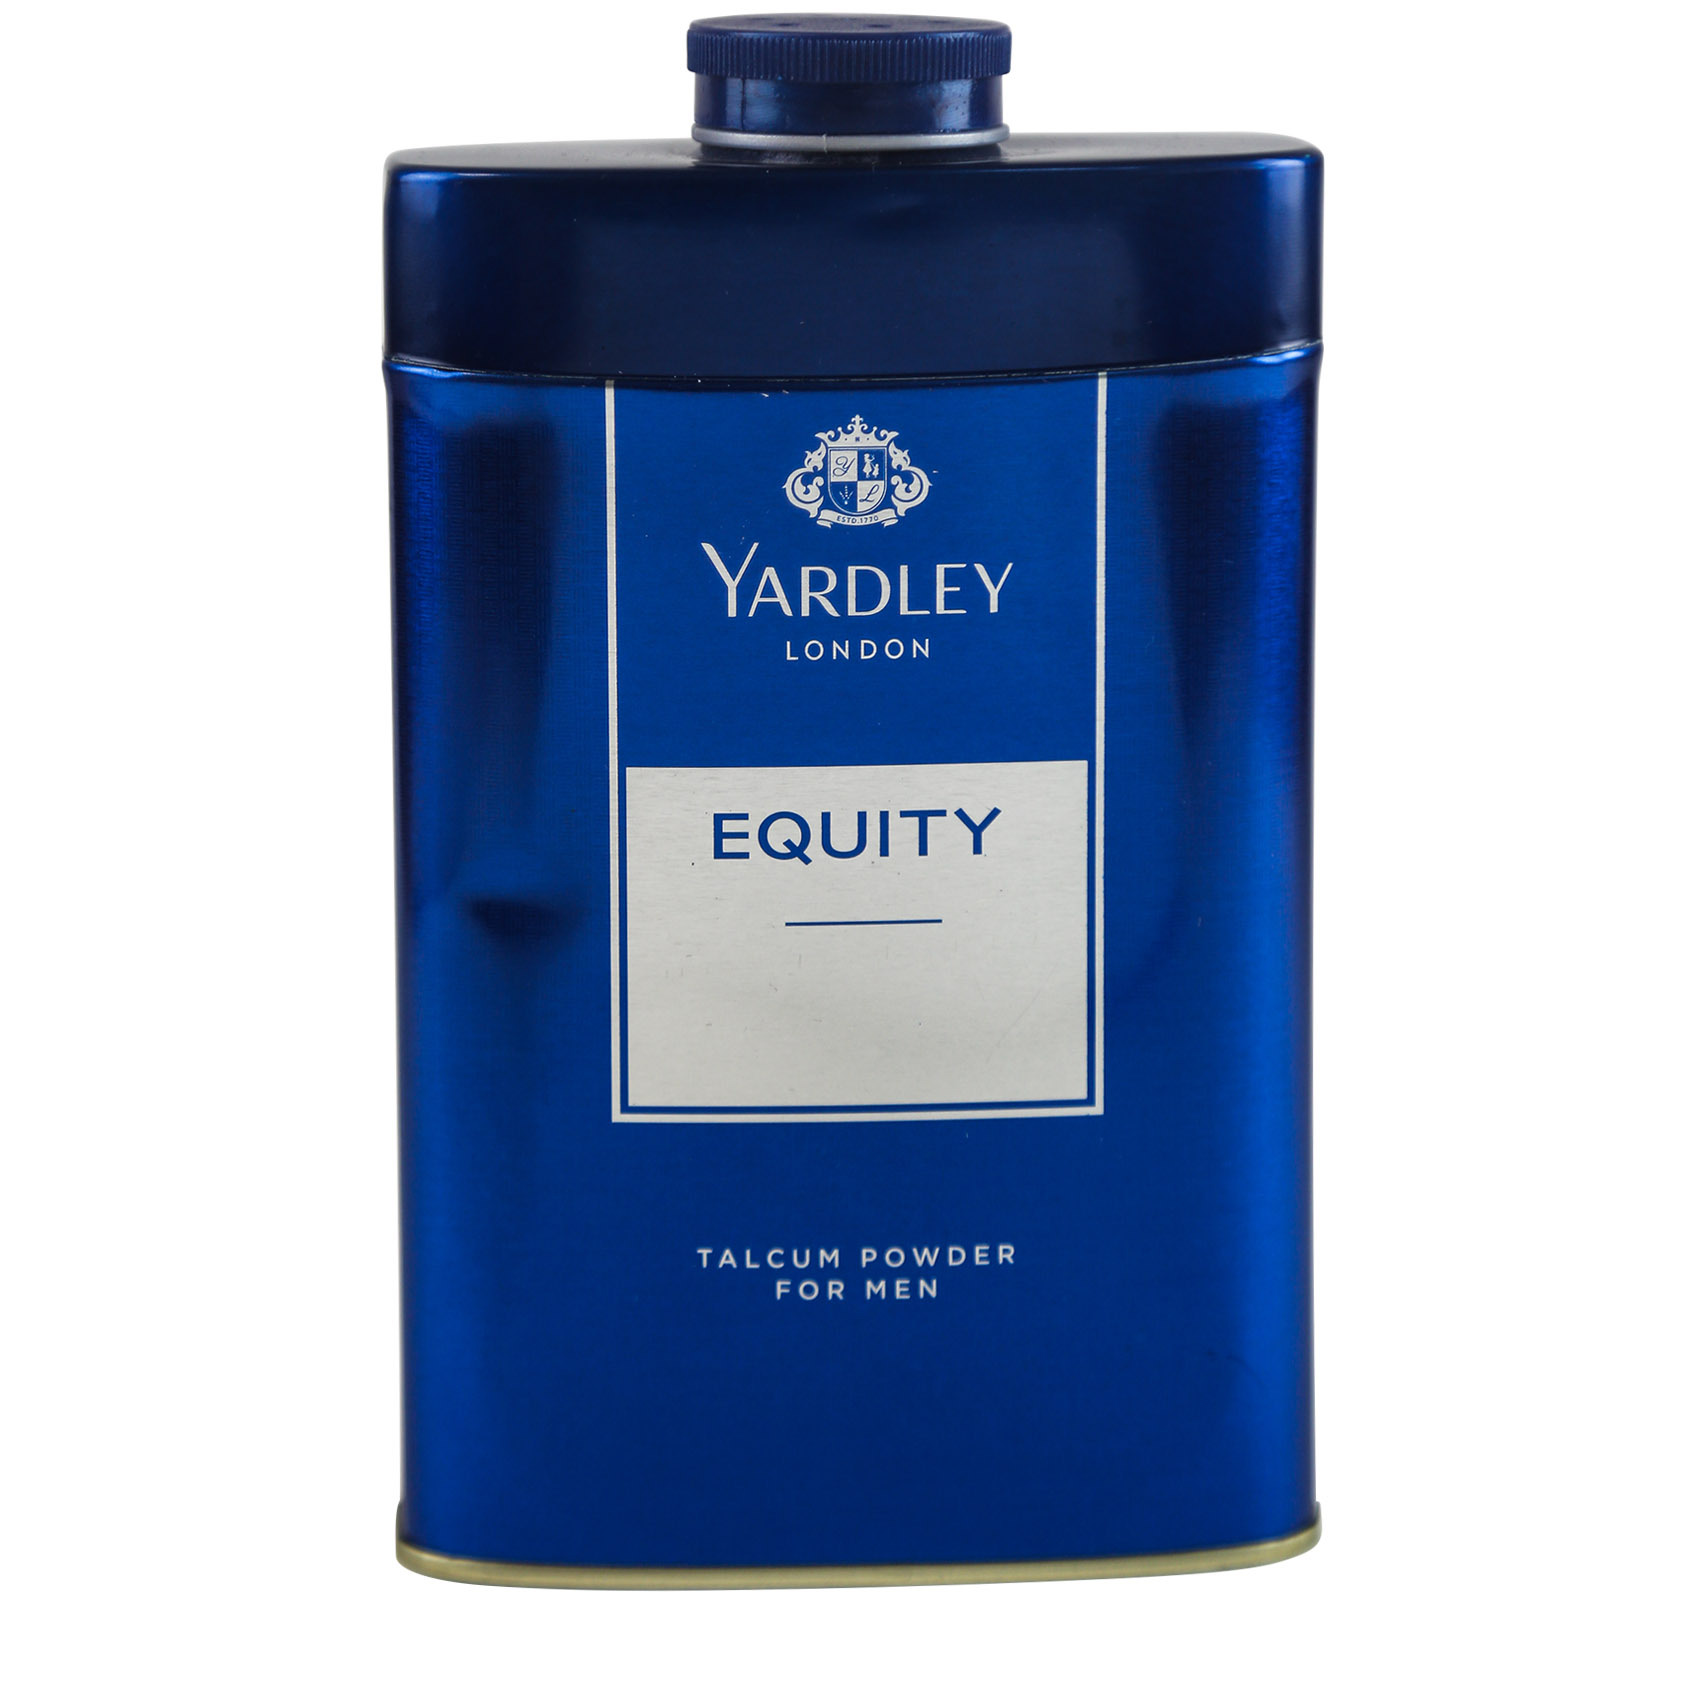 YARDLEY TALC MEN EQUITY 250GM